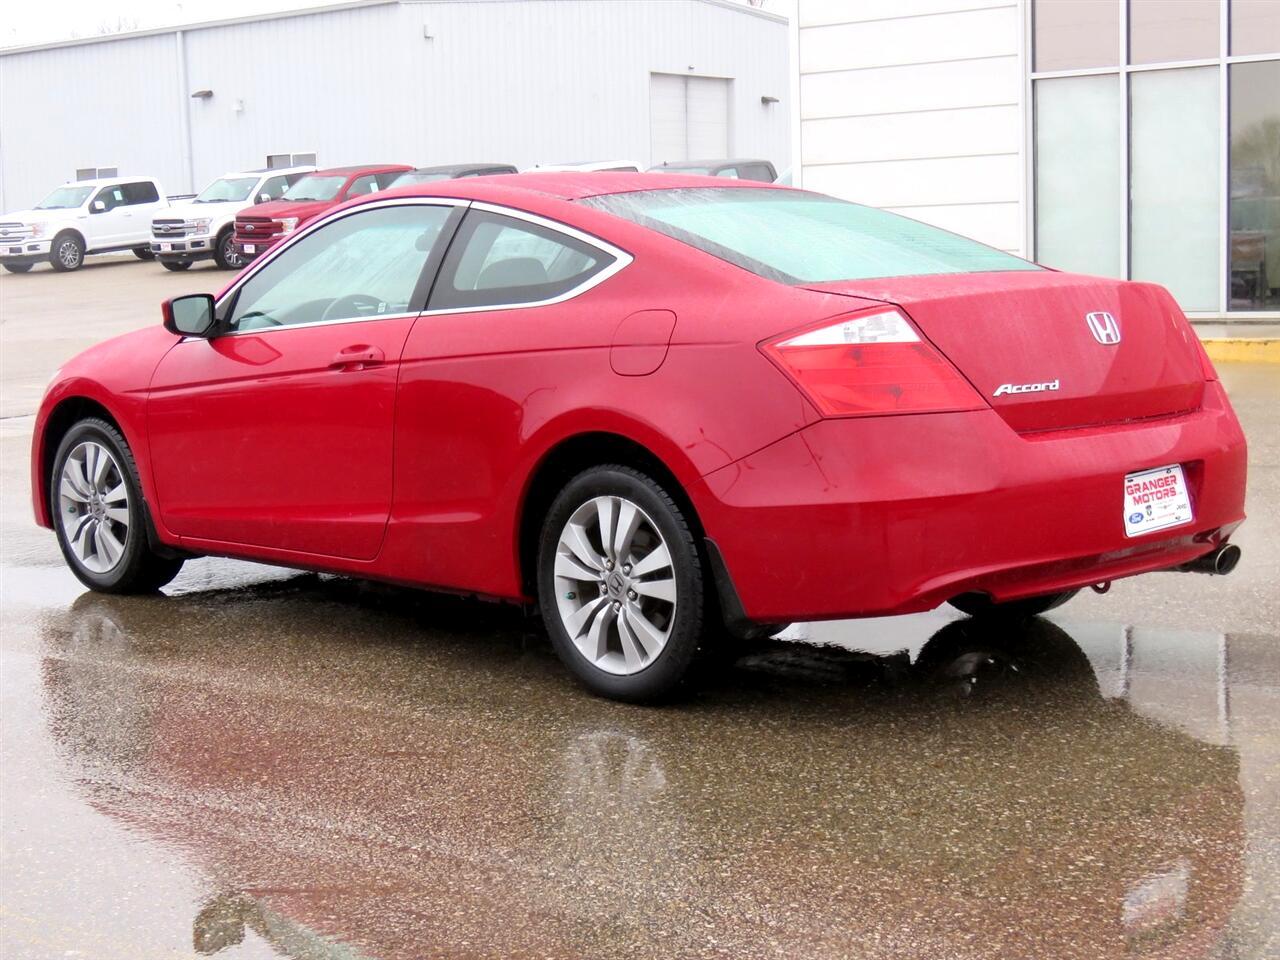 2010 Honda Accord LX-S Coupe